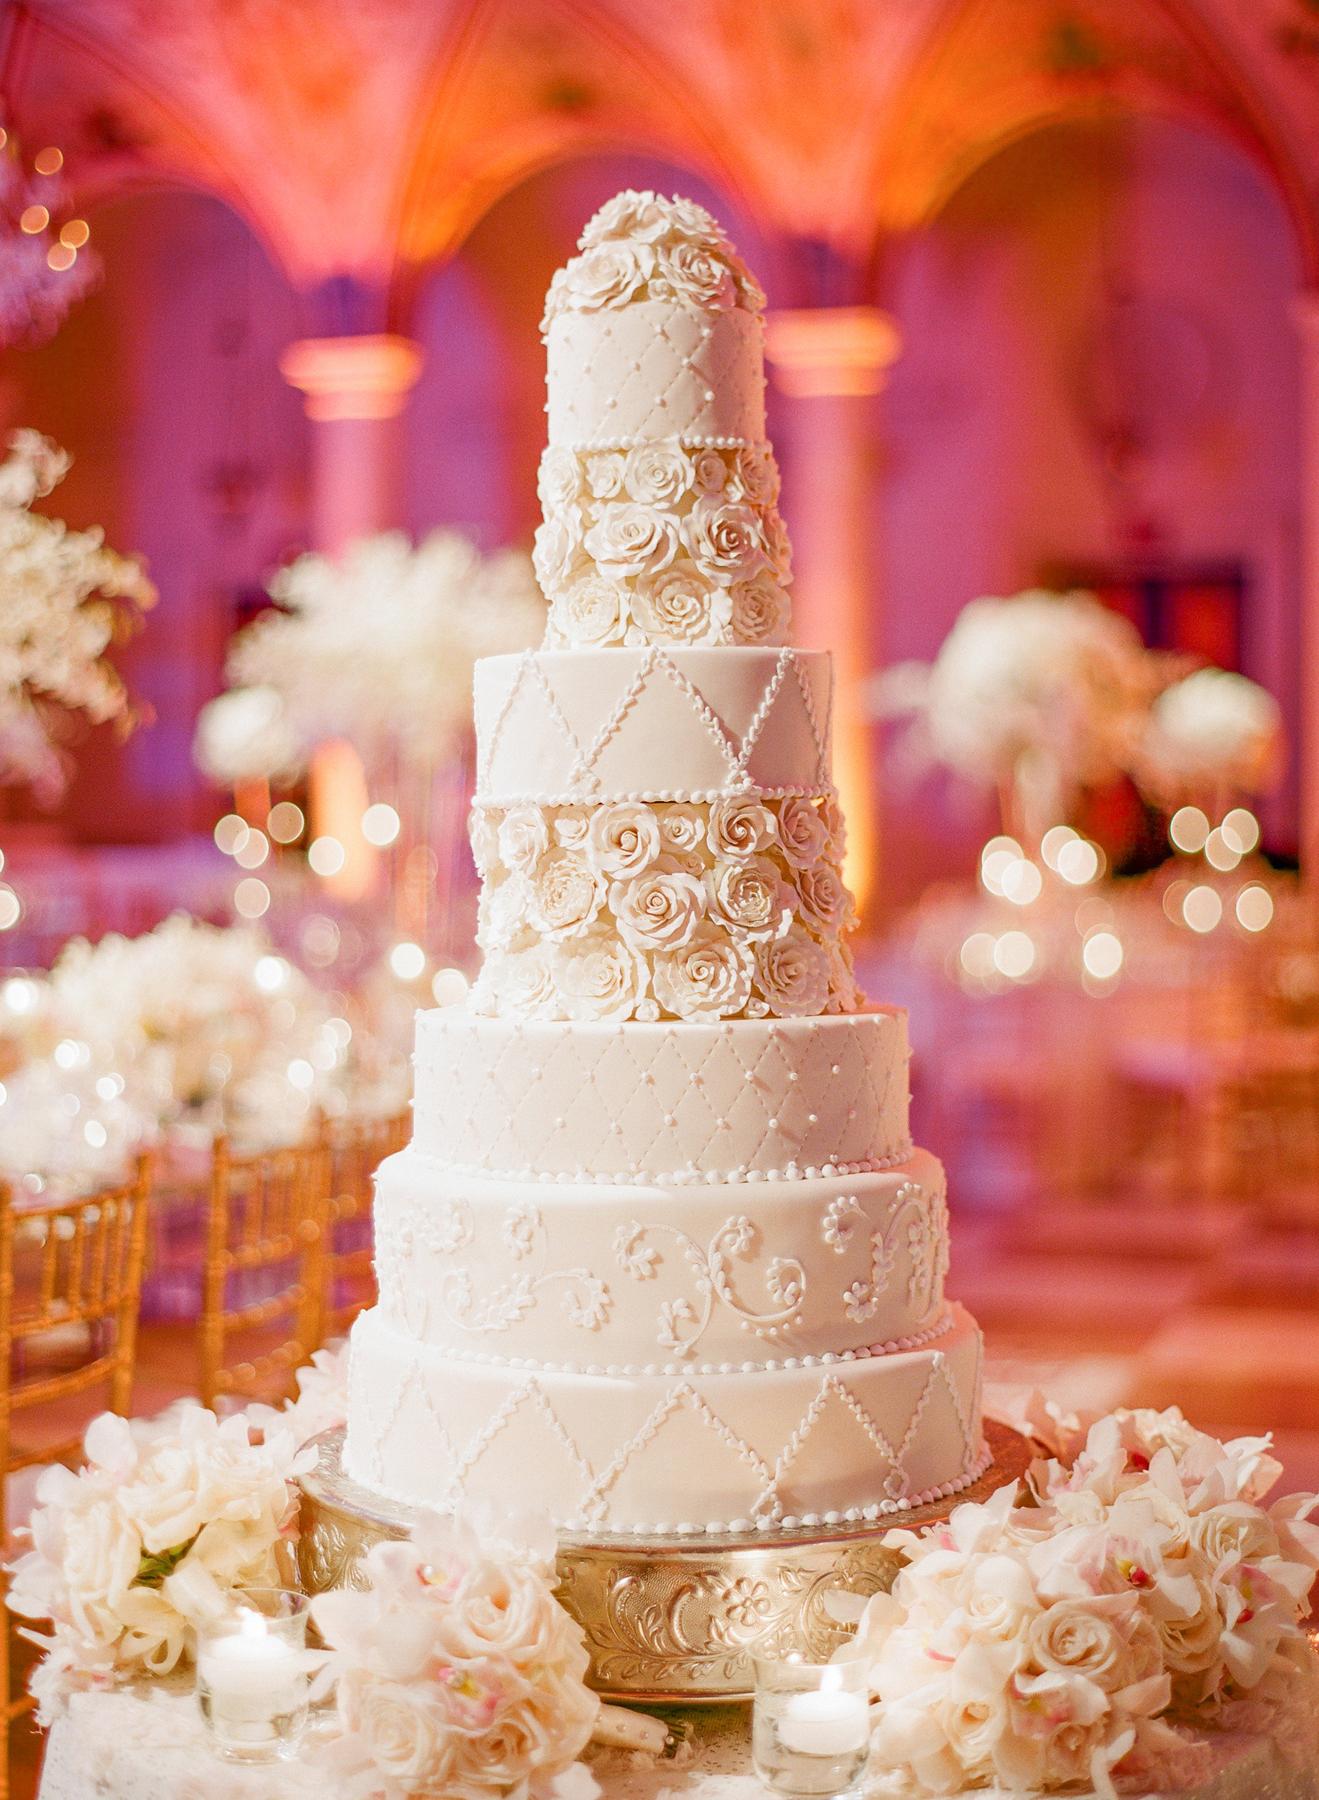 Glam white wedding cake with sugar flower tiers